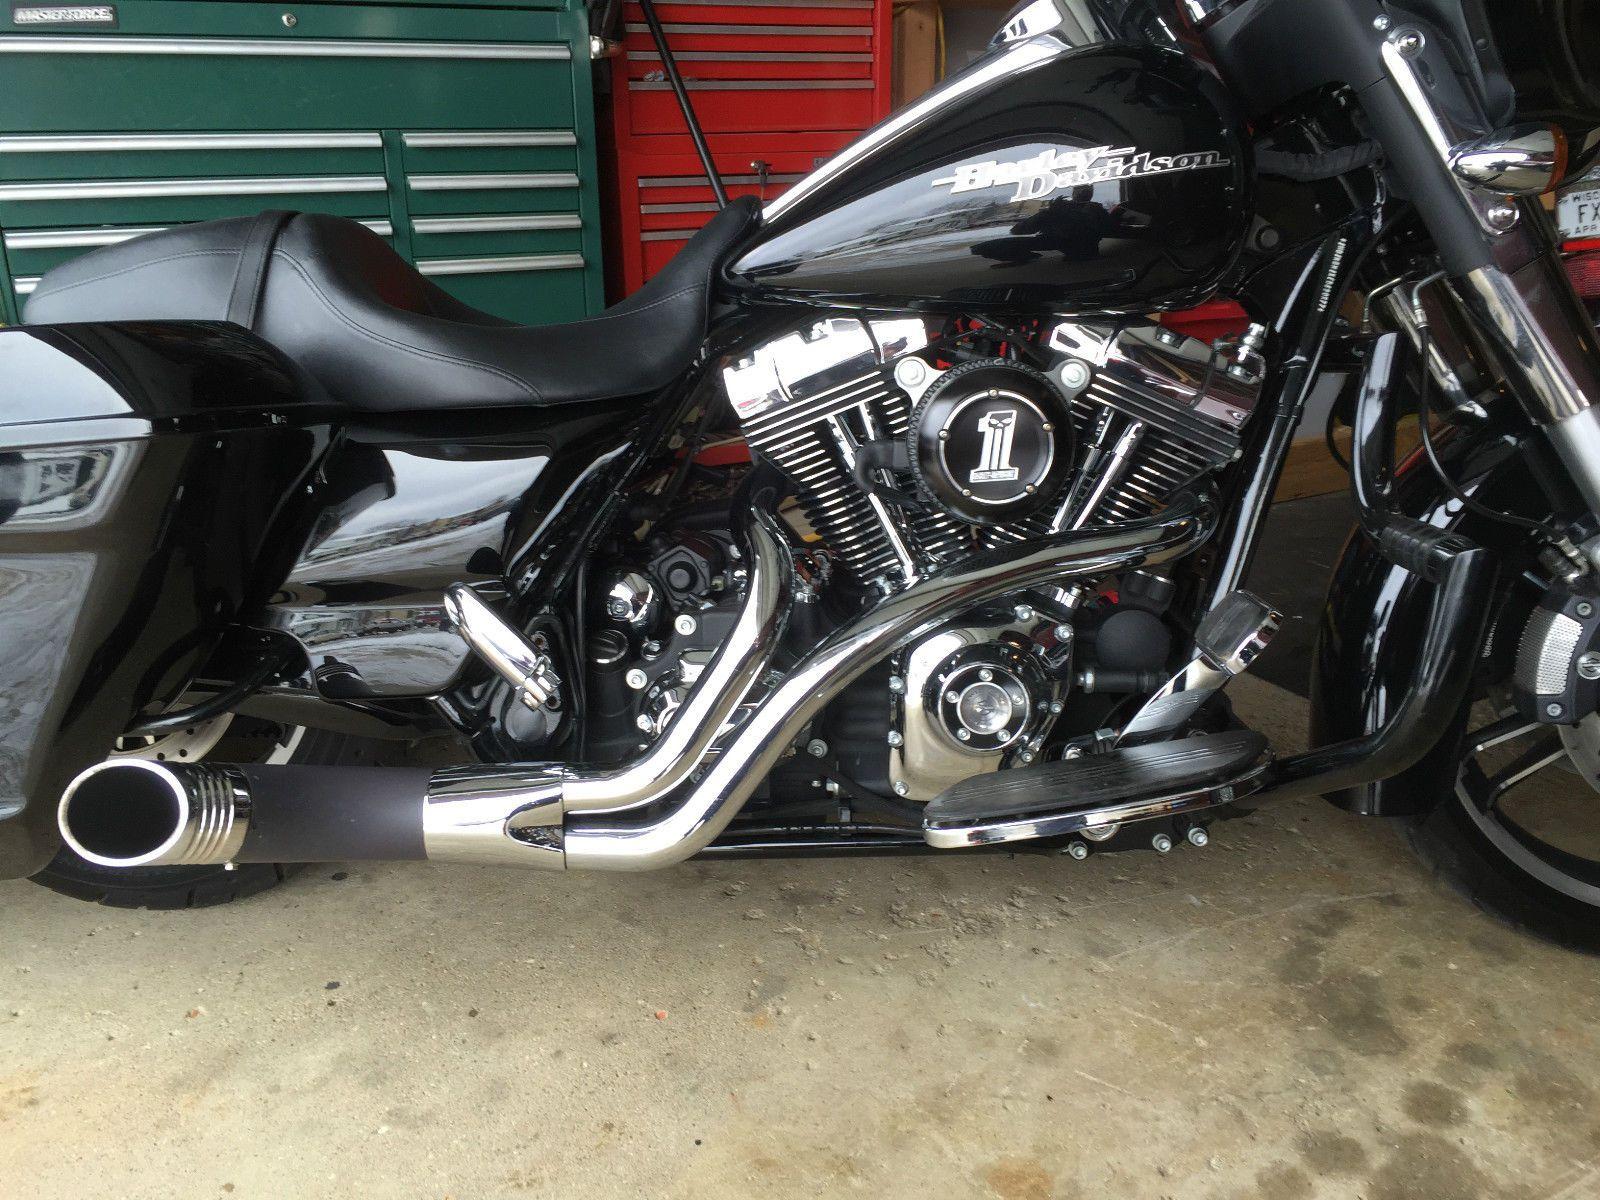 Harley Davidson Street Glide Hd Harley Davidson Wallpapers